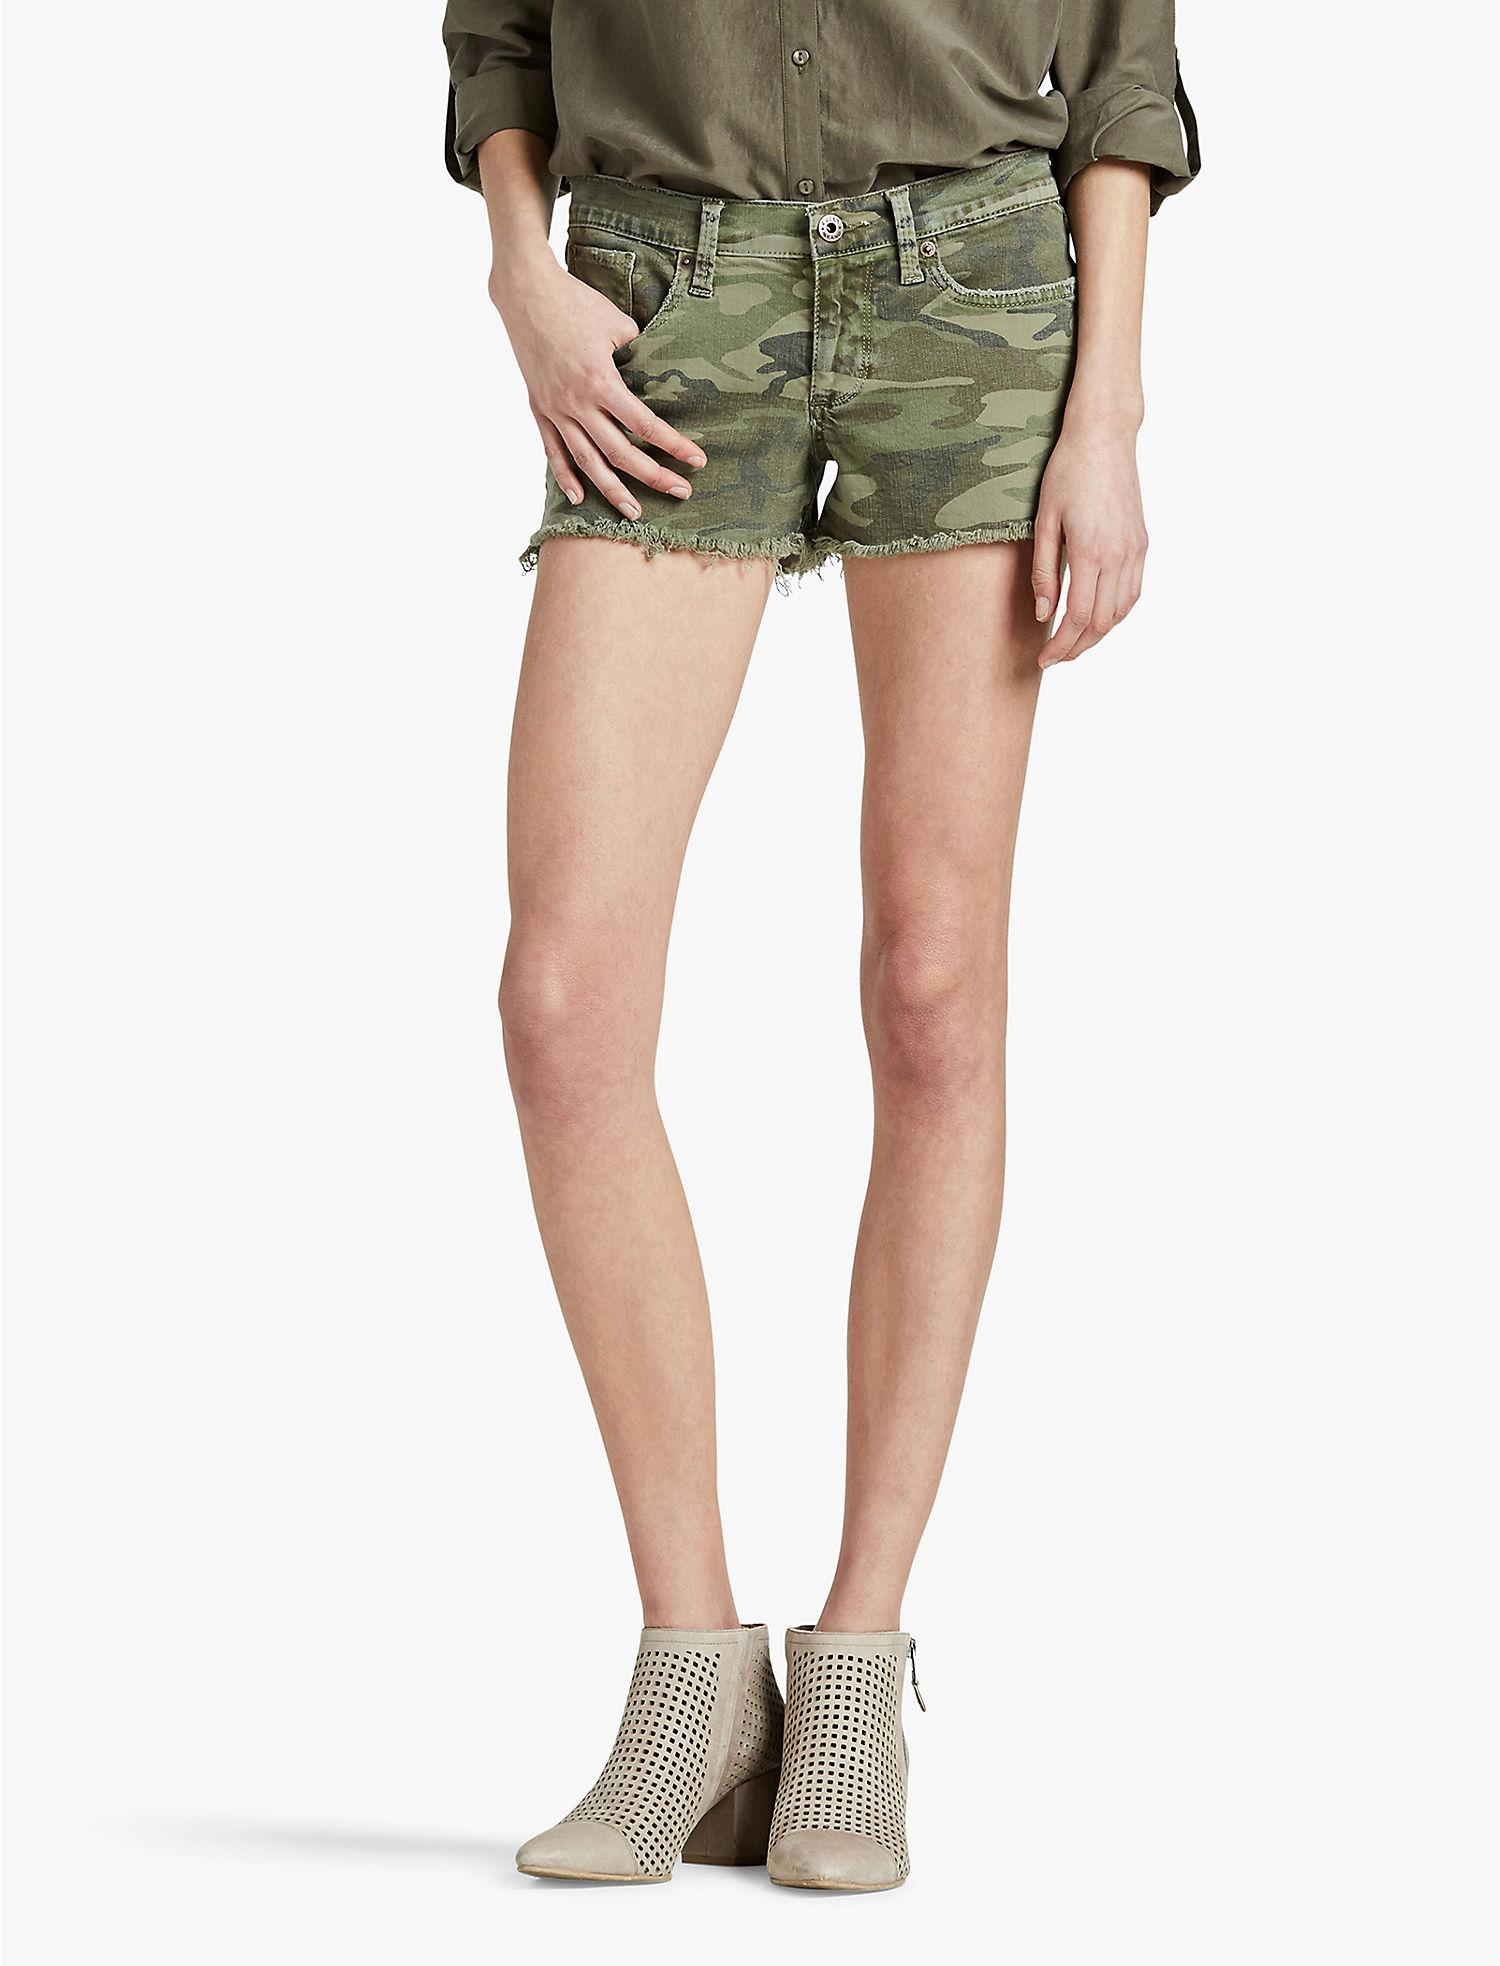 Green Denim Shorts for Women | Lucky Brand